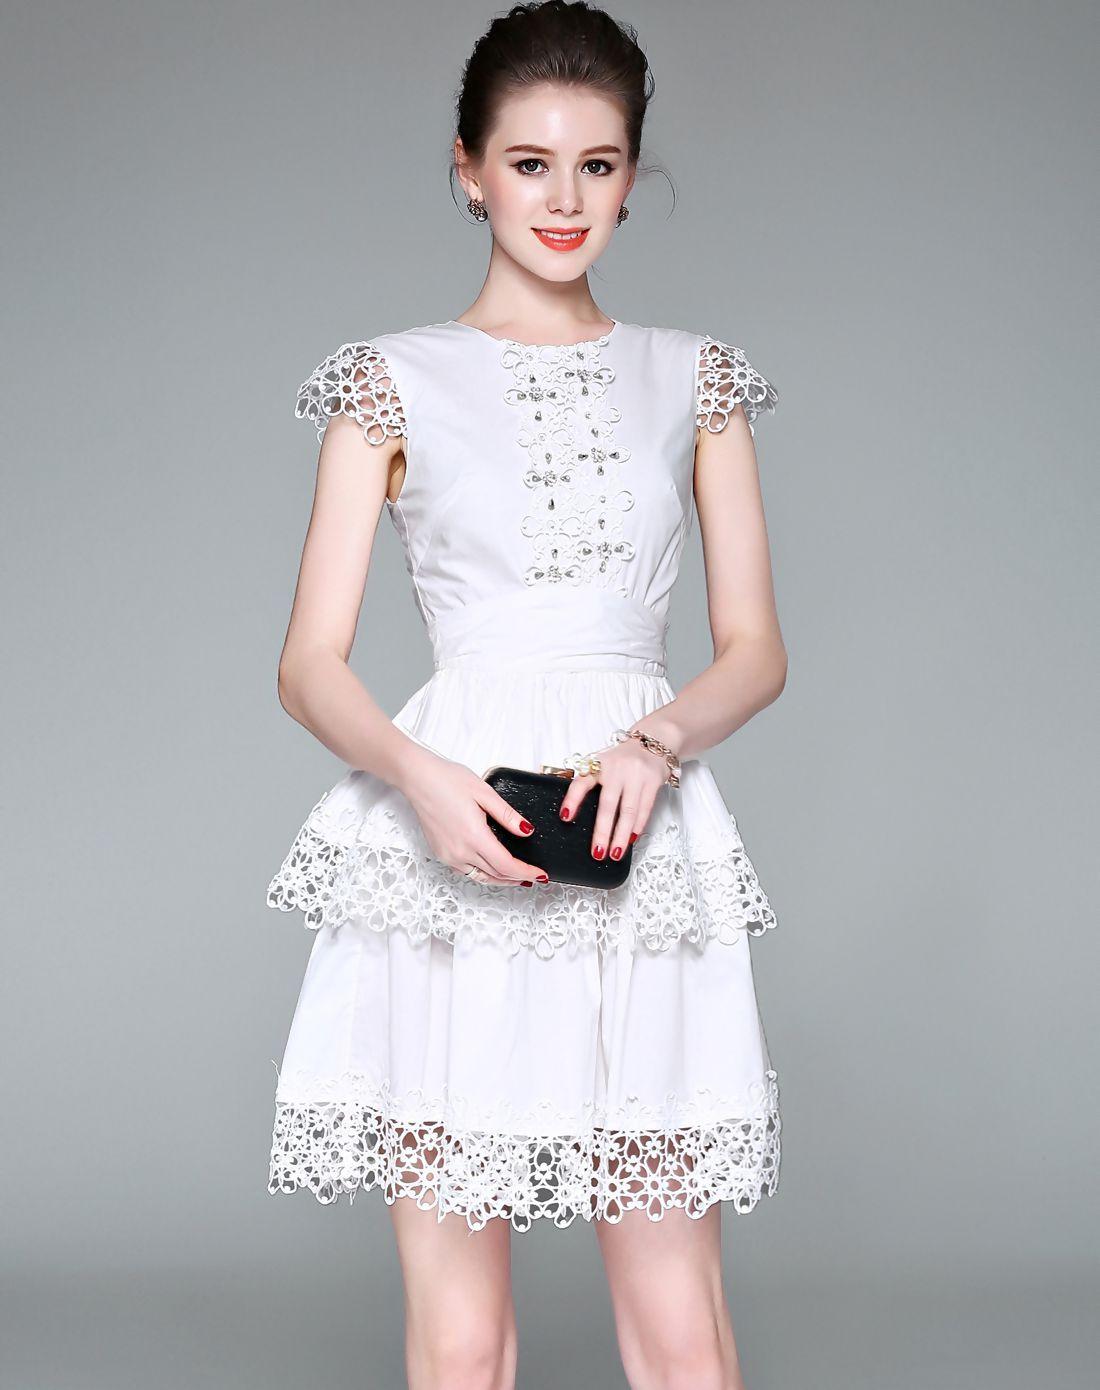 Adorewe vipme skater dressesdesigner zeraco white beaded cap